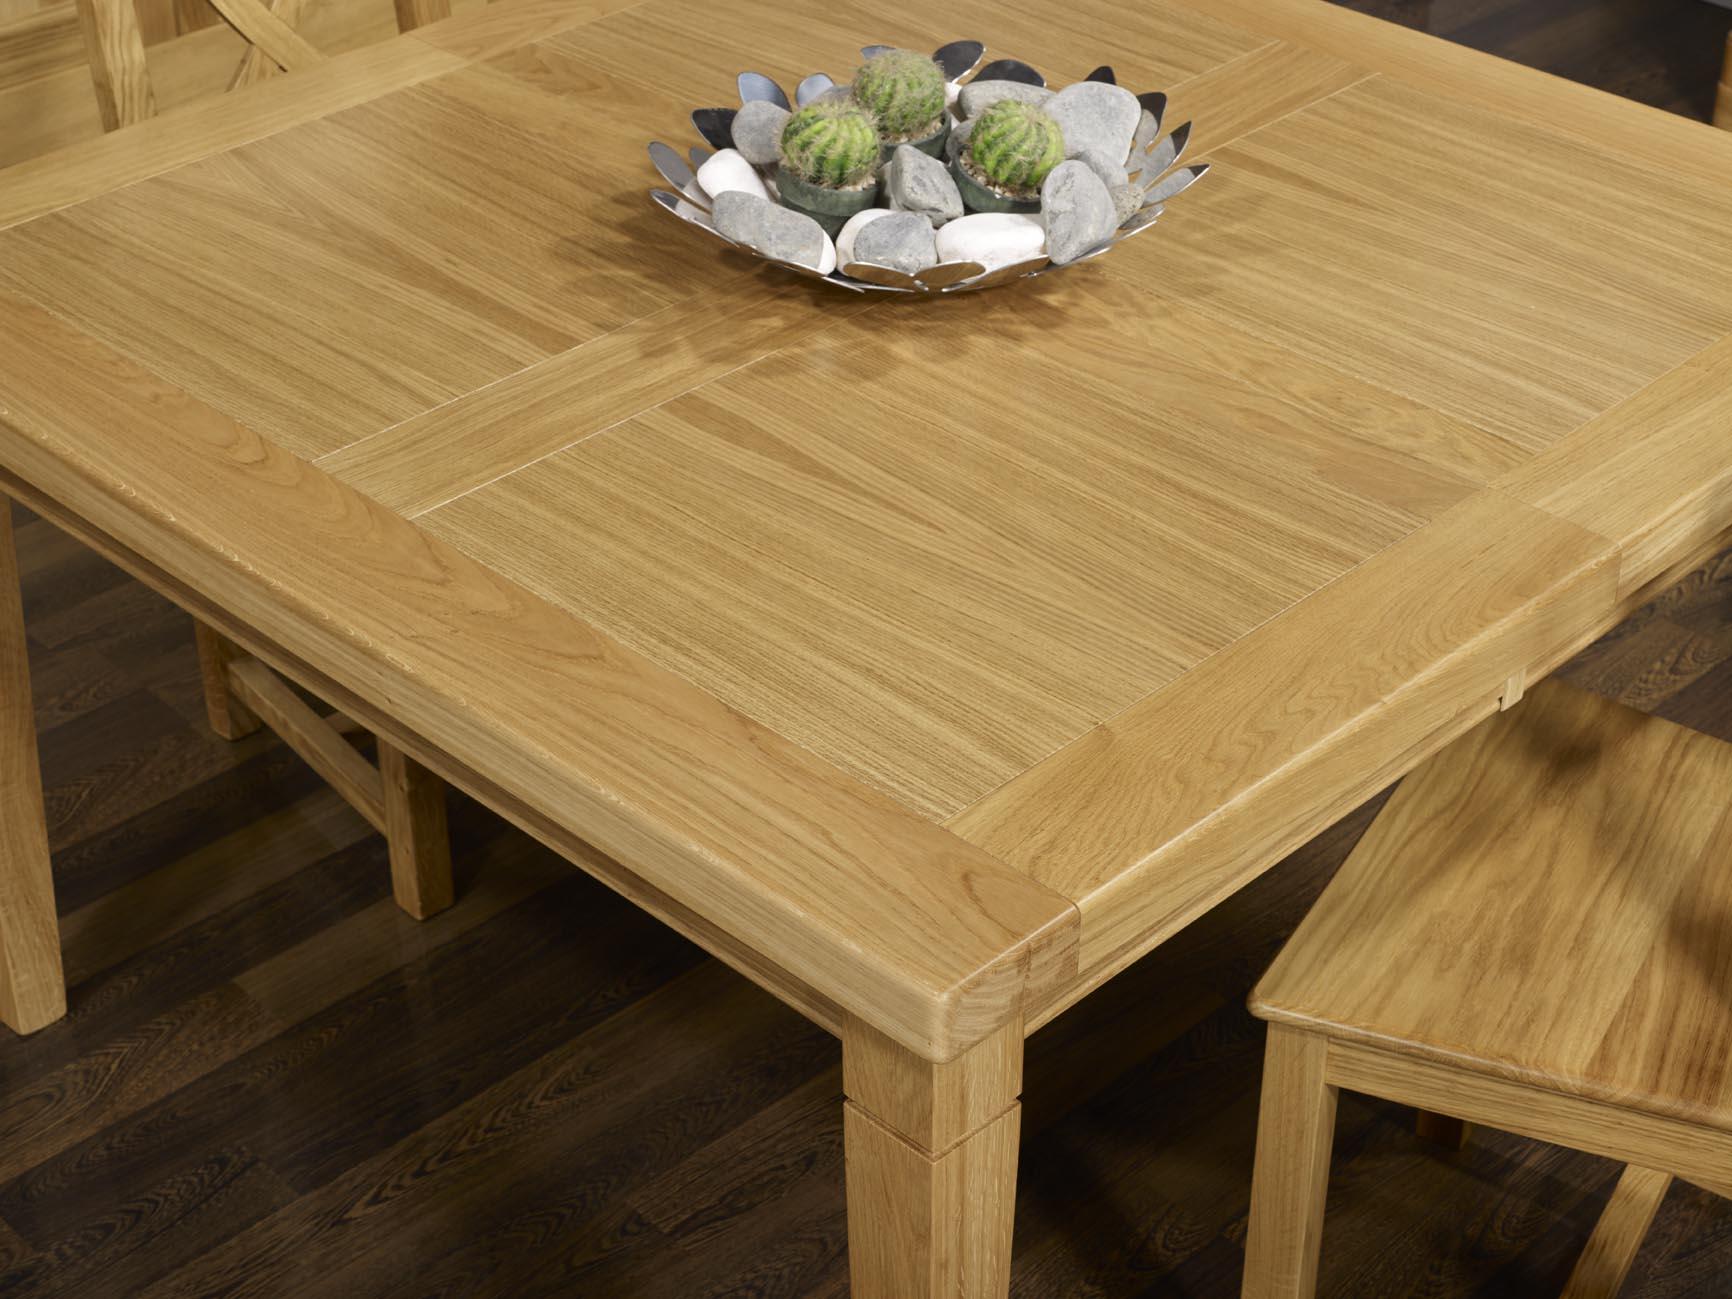 Mesa de comedor cuadrada de madera de roble macizo 130x130 estilo ...